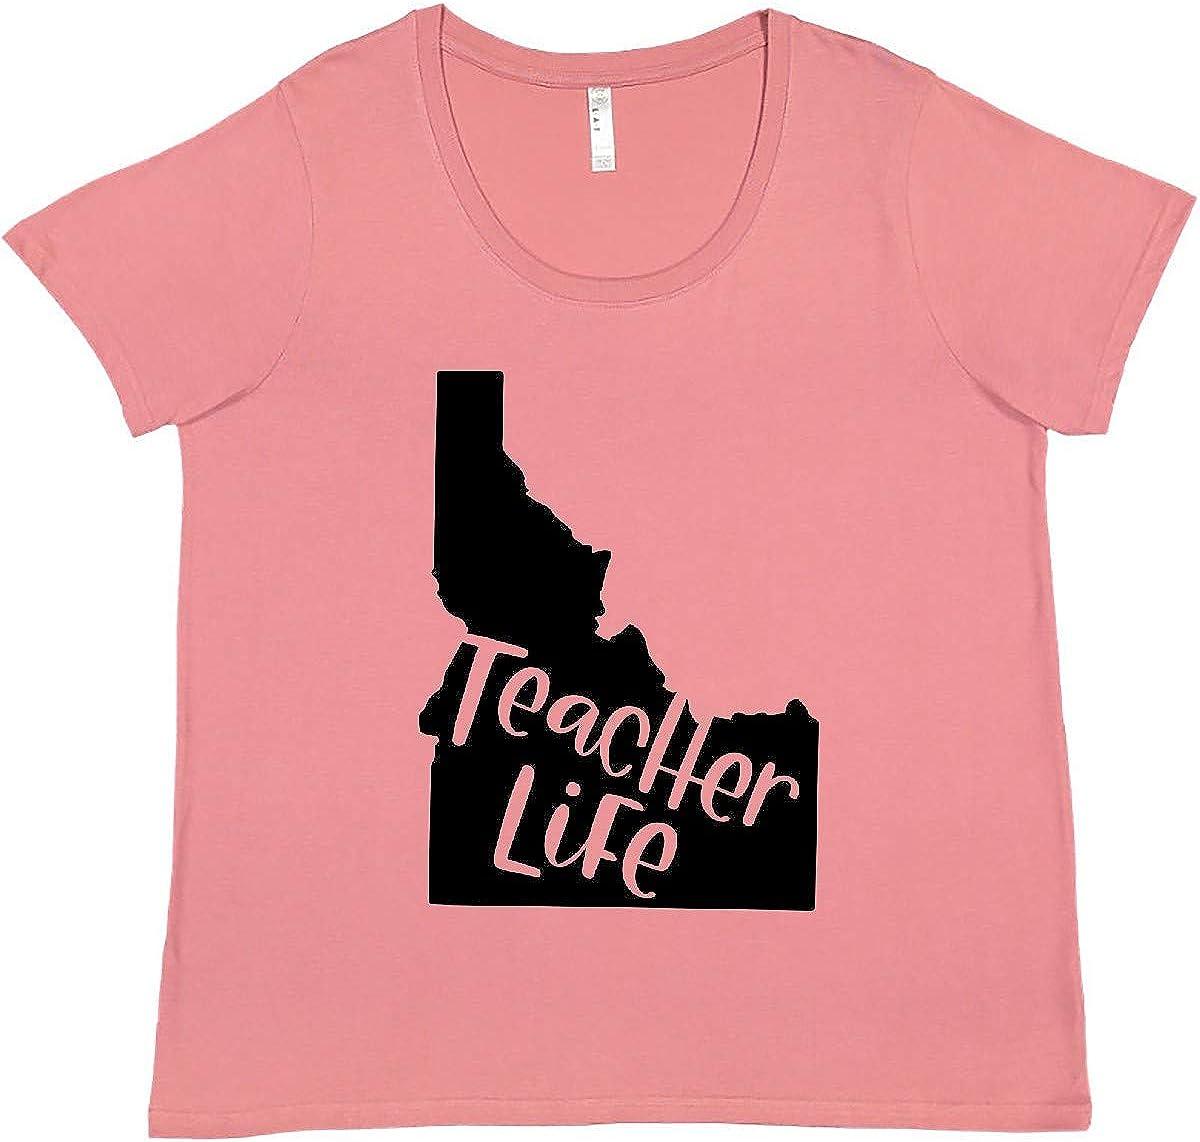 inktastic Idaho Fees free!! Teacher Life 5 ☆ popular Plus T-Shirt Size Women's